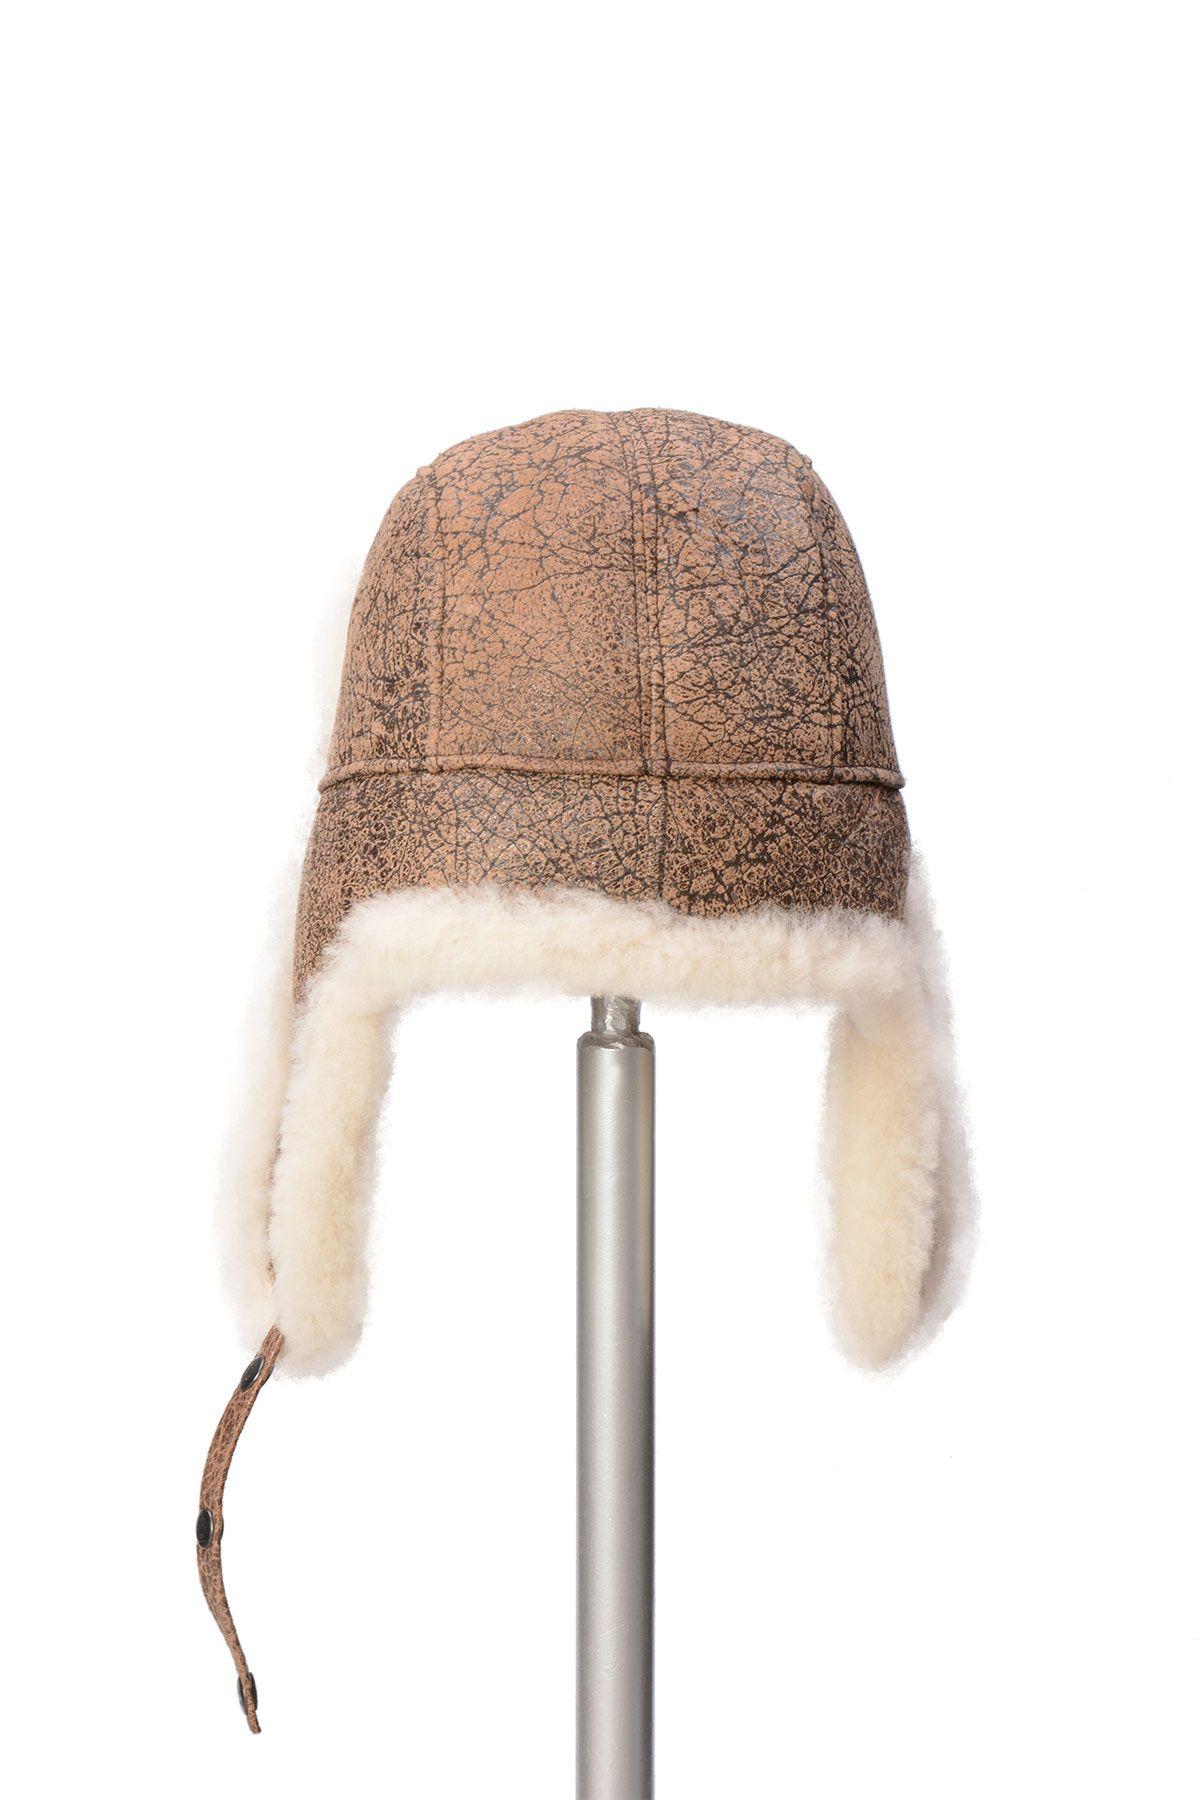 Pegia Hakiki Kürklü Şapka 19SB04 Kahve